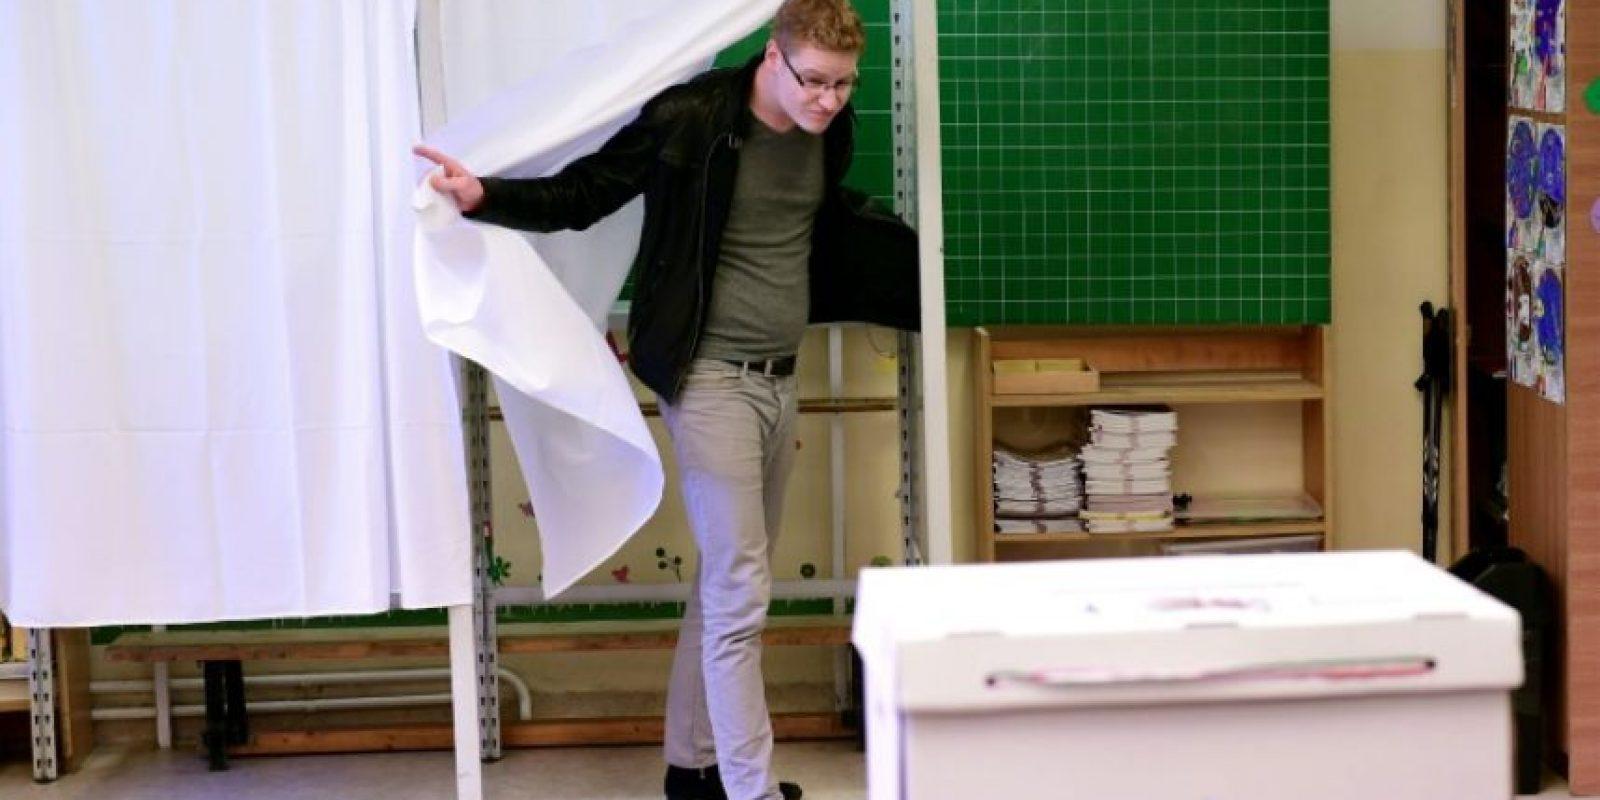 Un votante se pronuncia en el referéndum sobre la política migratoria el 2 de octubre de 2016 en Budapest Foto:Attila Kisbenedek/afp.com